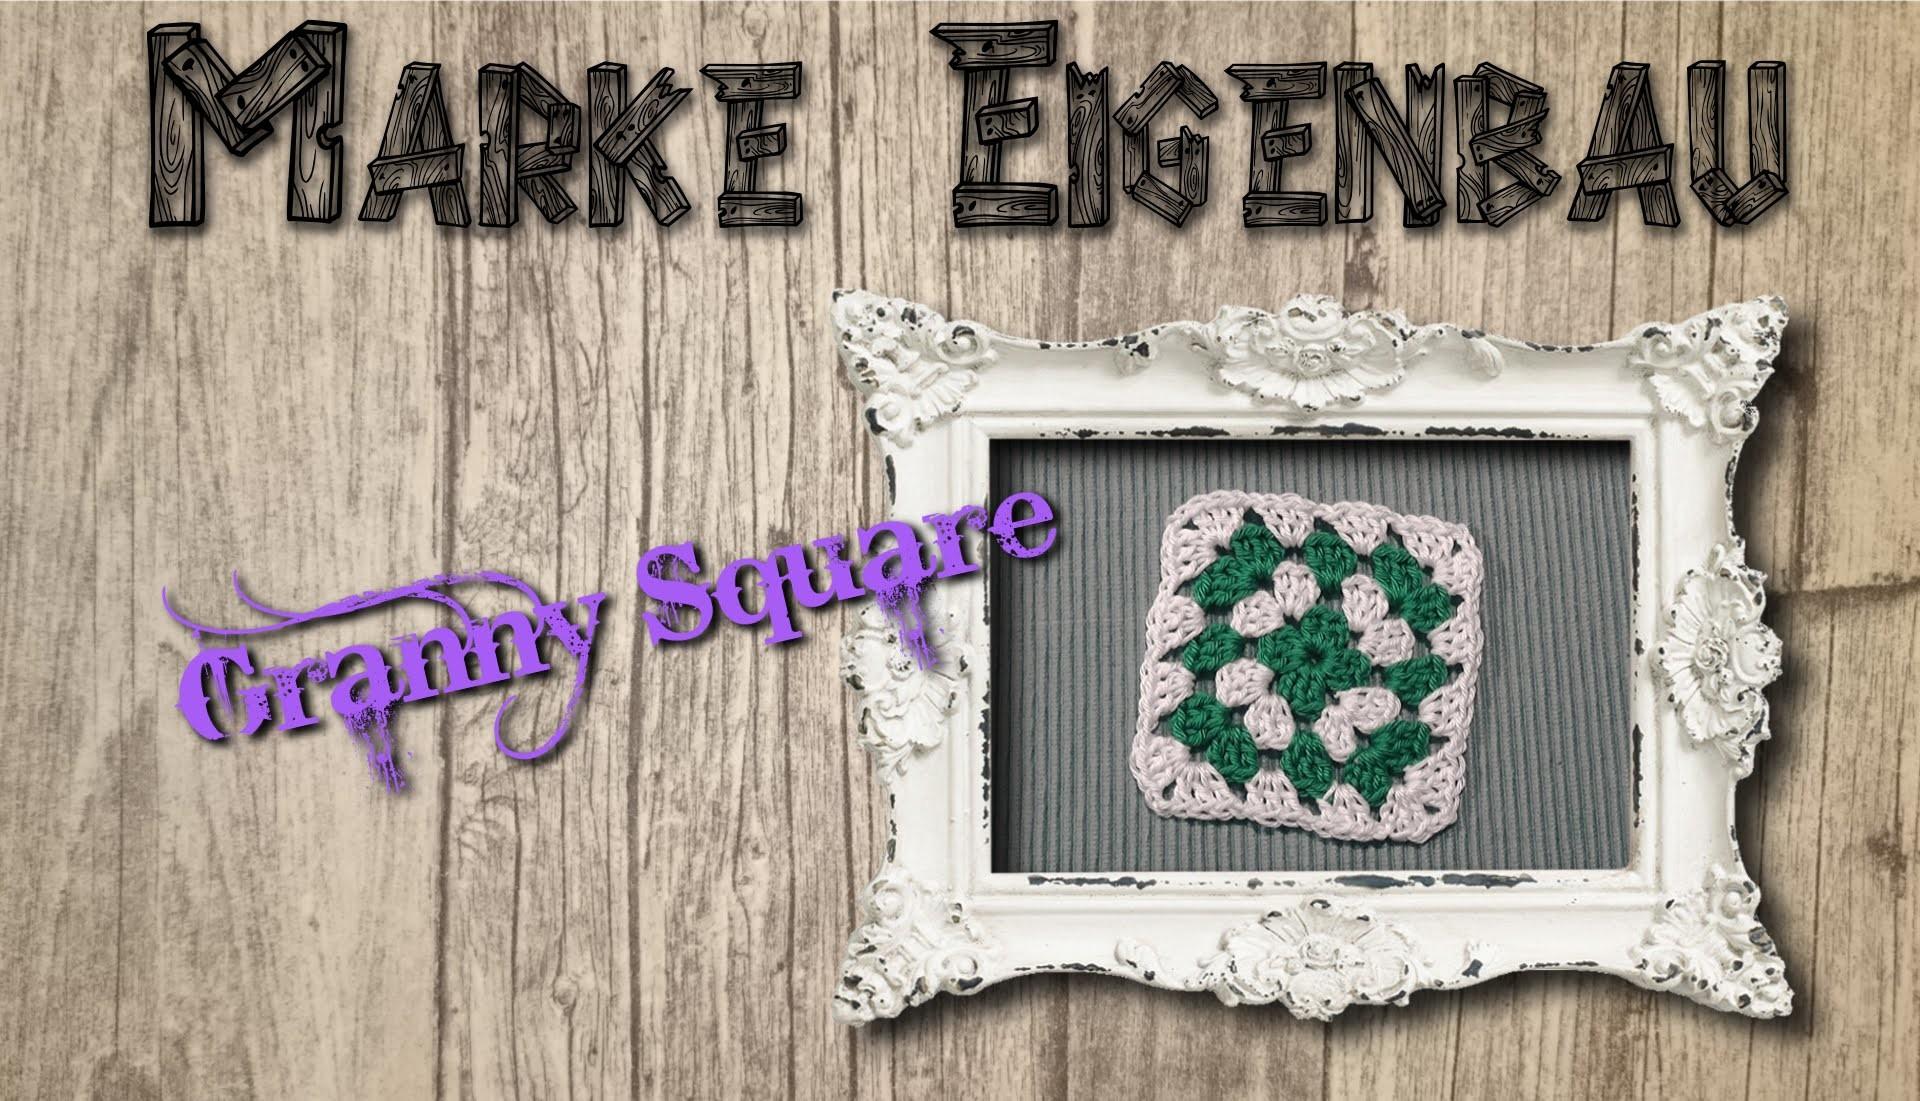 Häkeln Folge 2 - Granny Square Muster 1